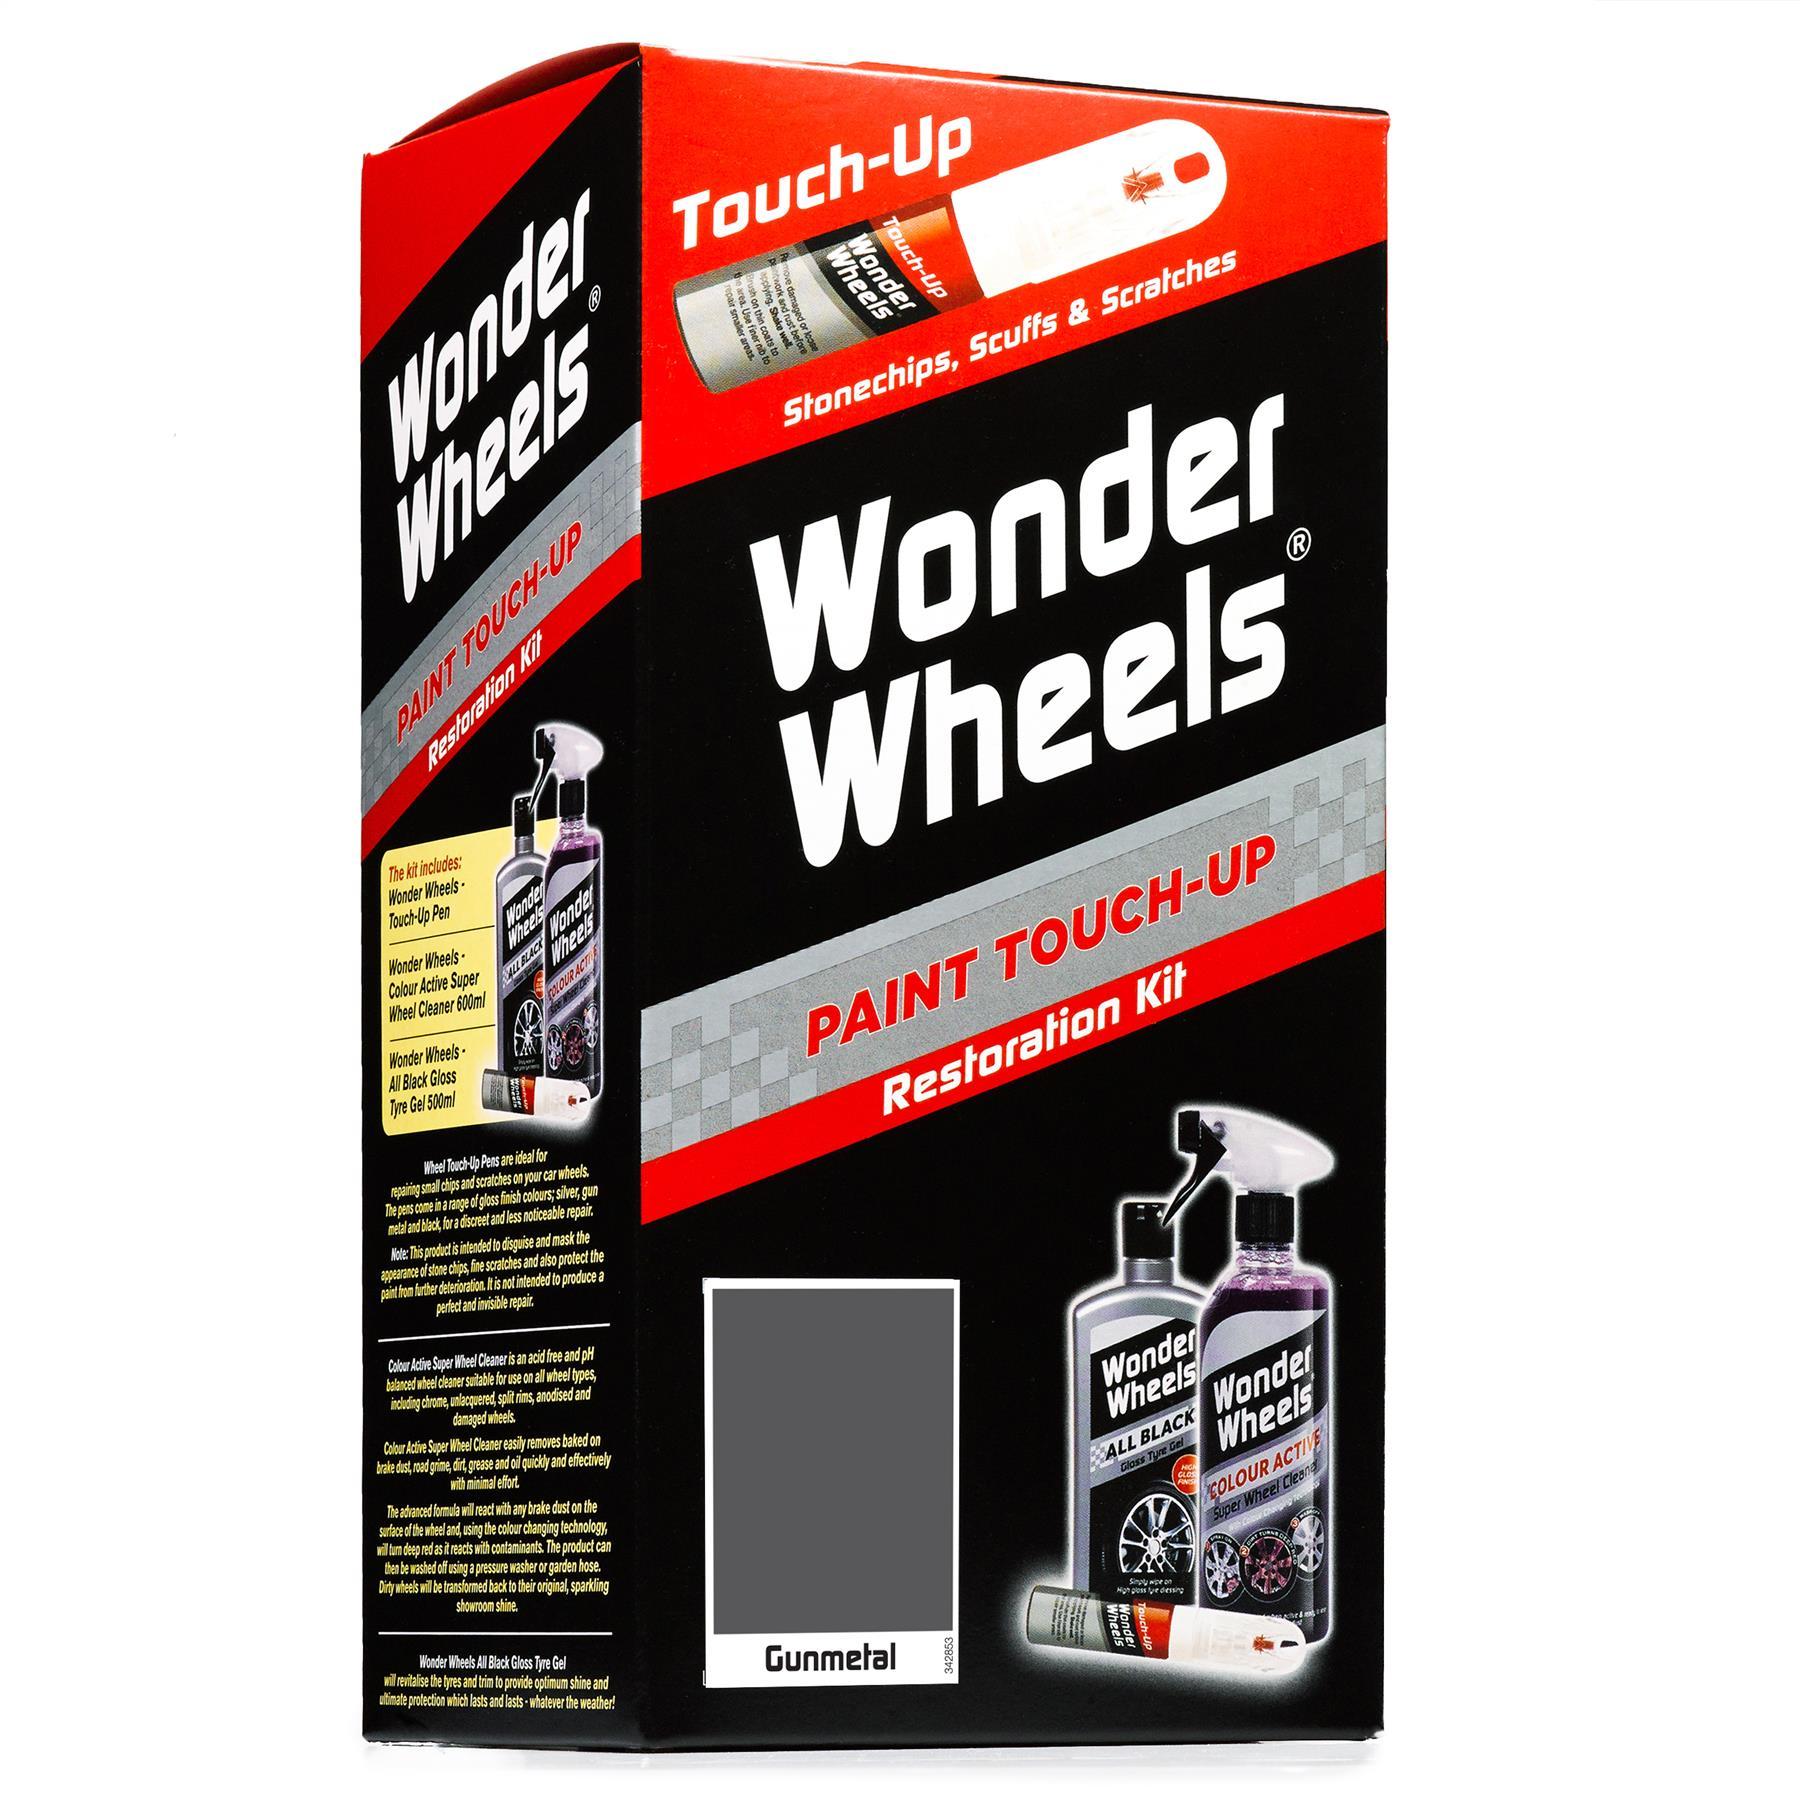 thumbnail 11 - Wonder-Wheels-Paint-Touch-Up-Restoration-Kit